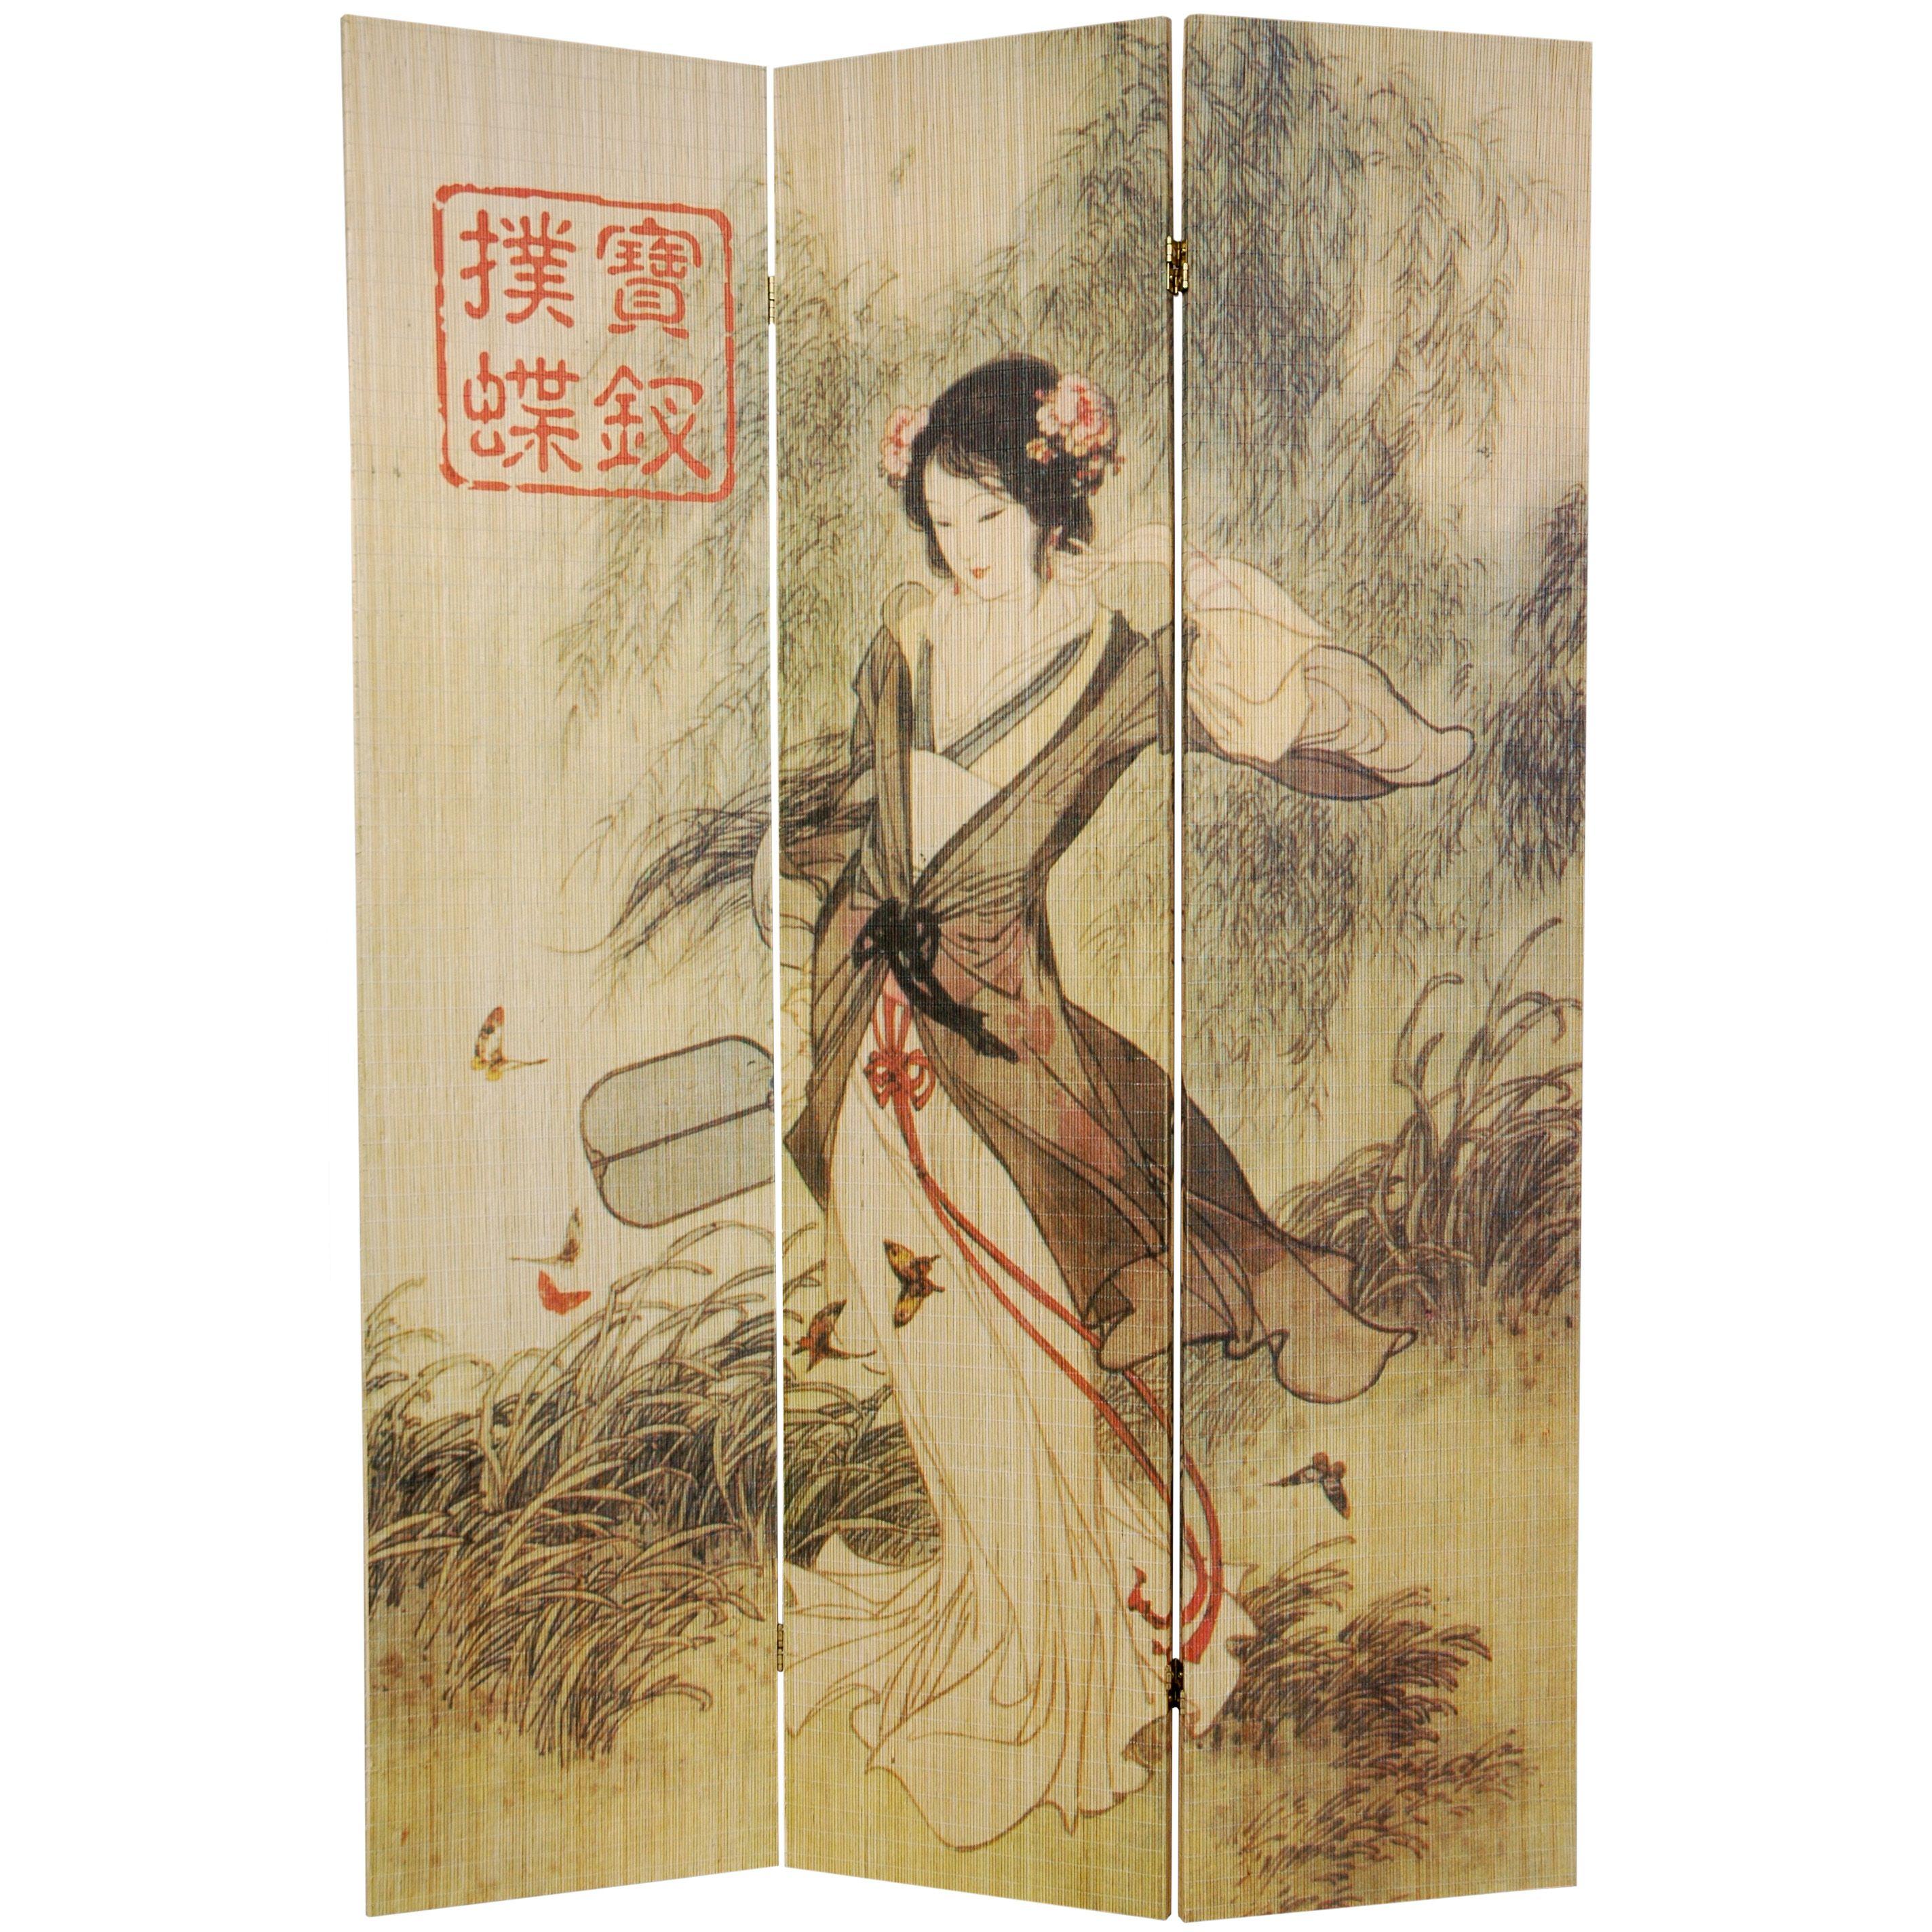 ft tall asian beauty bamboo room divider bamboo room divider